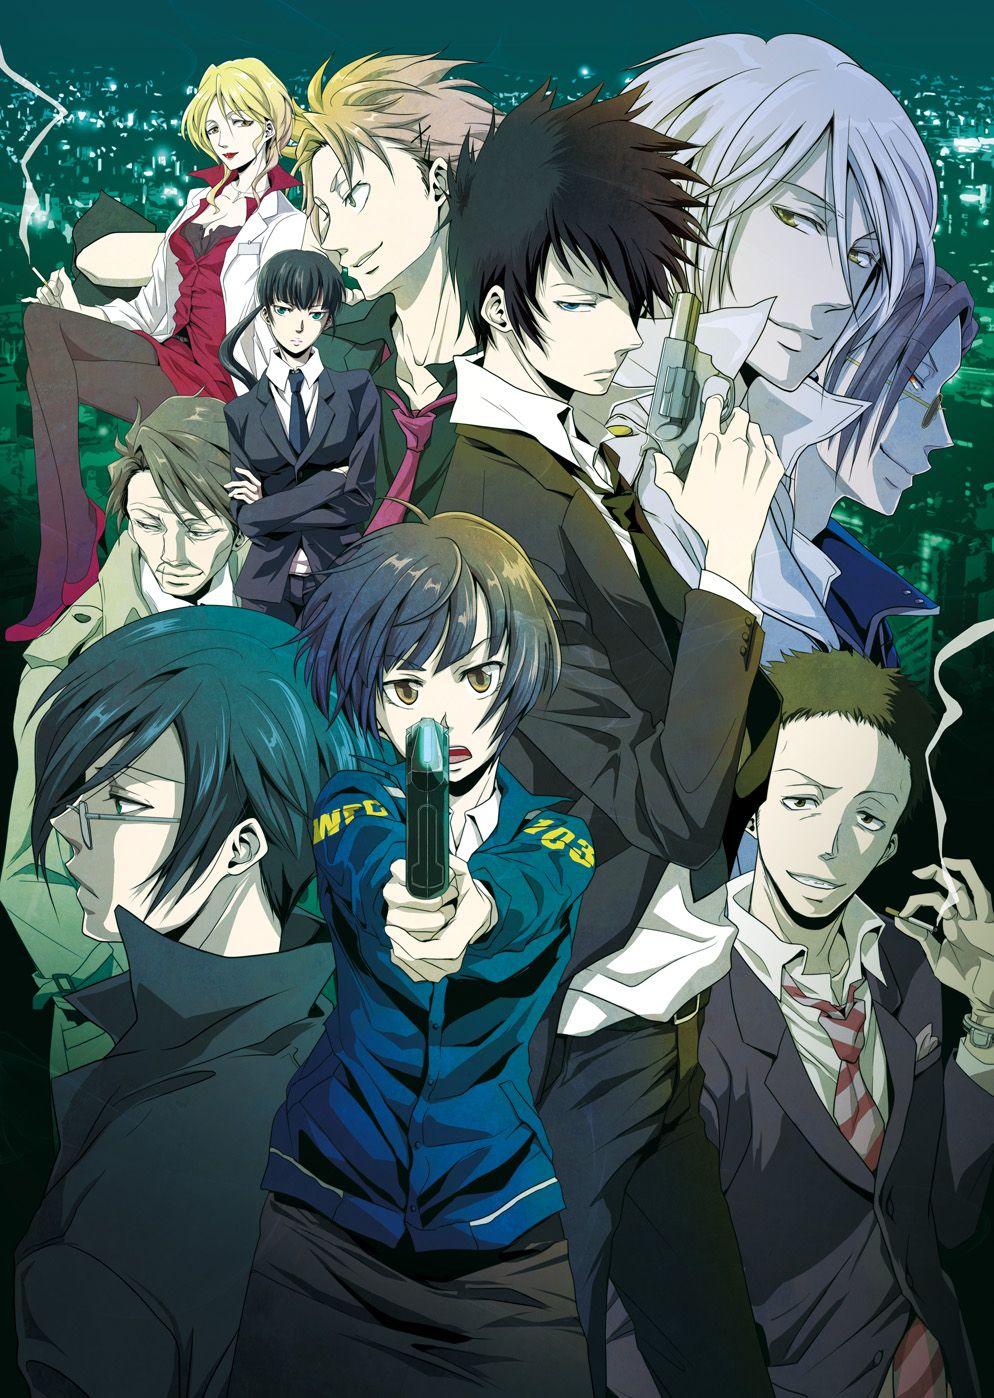 Psycho pass Psycho pass, Anime, Anime nerd